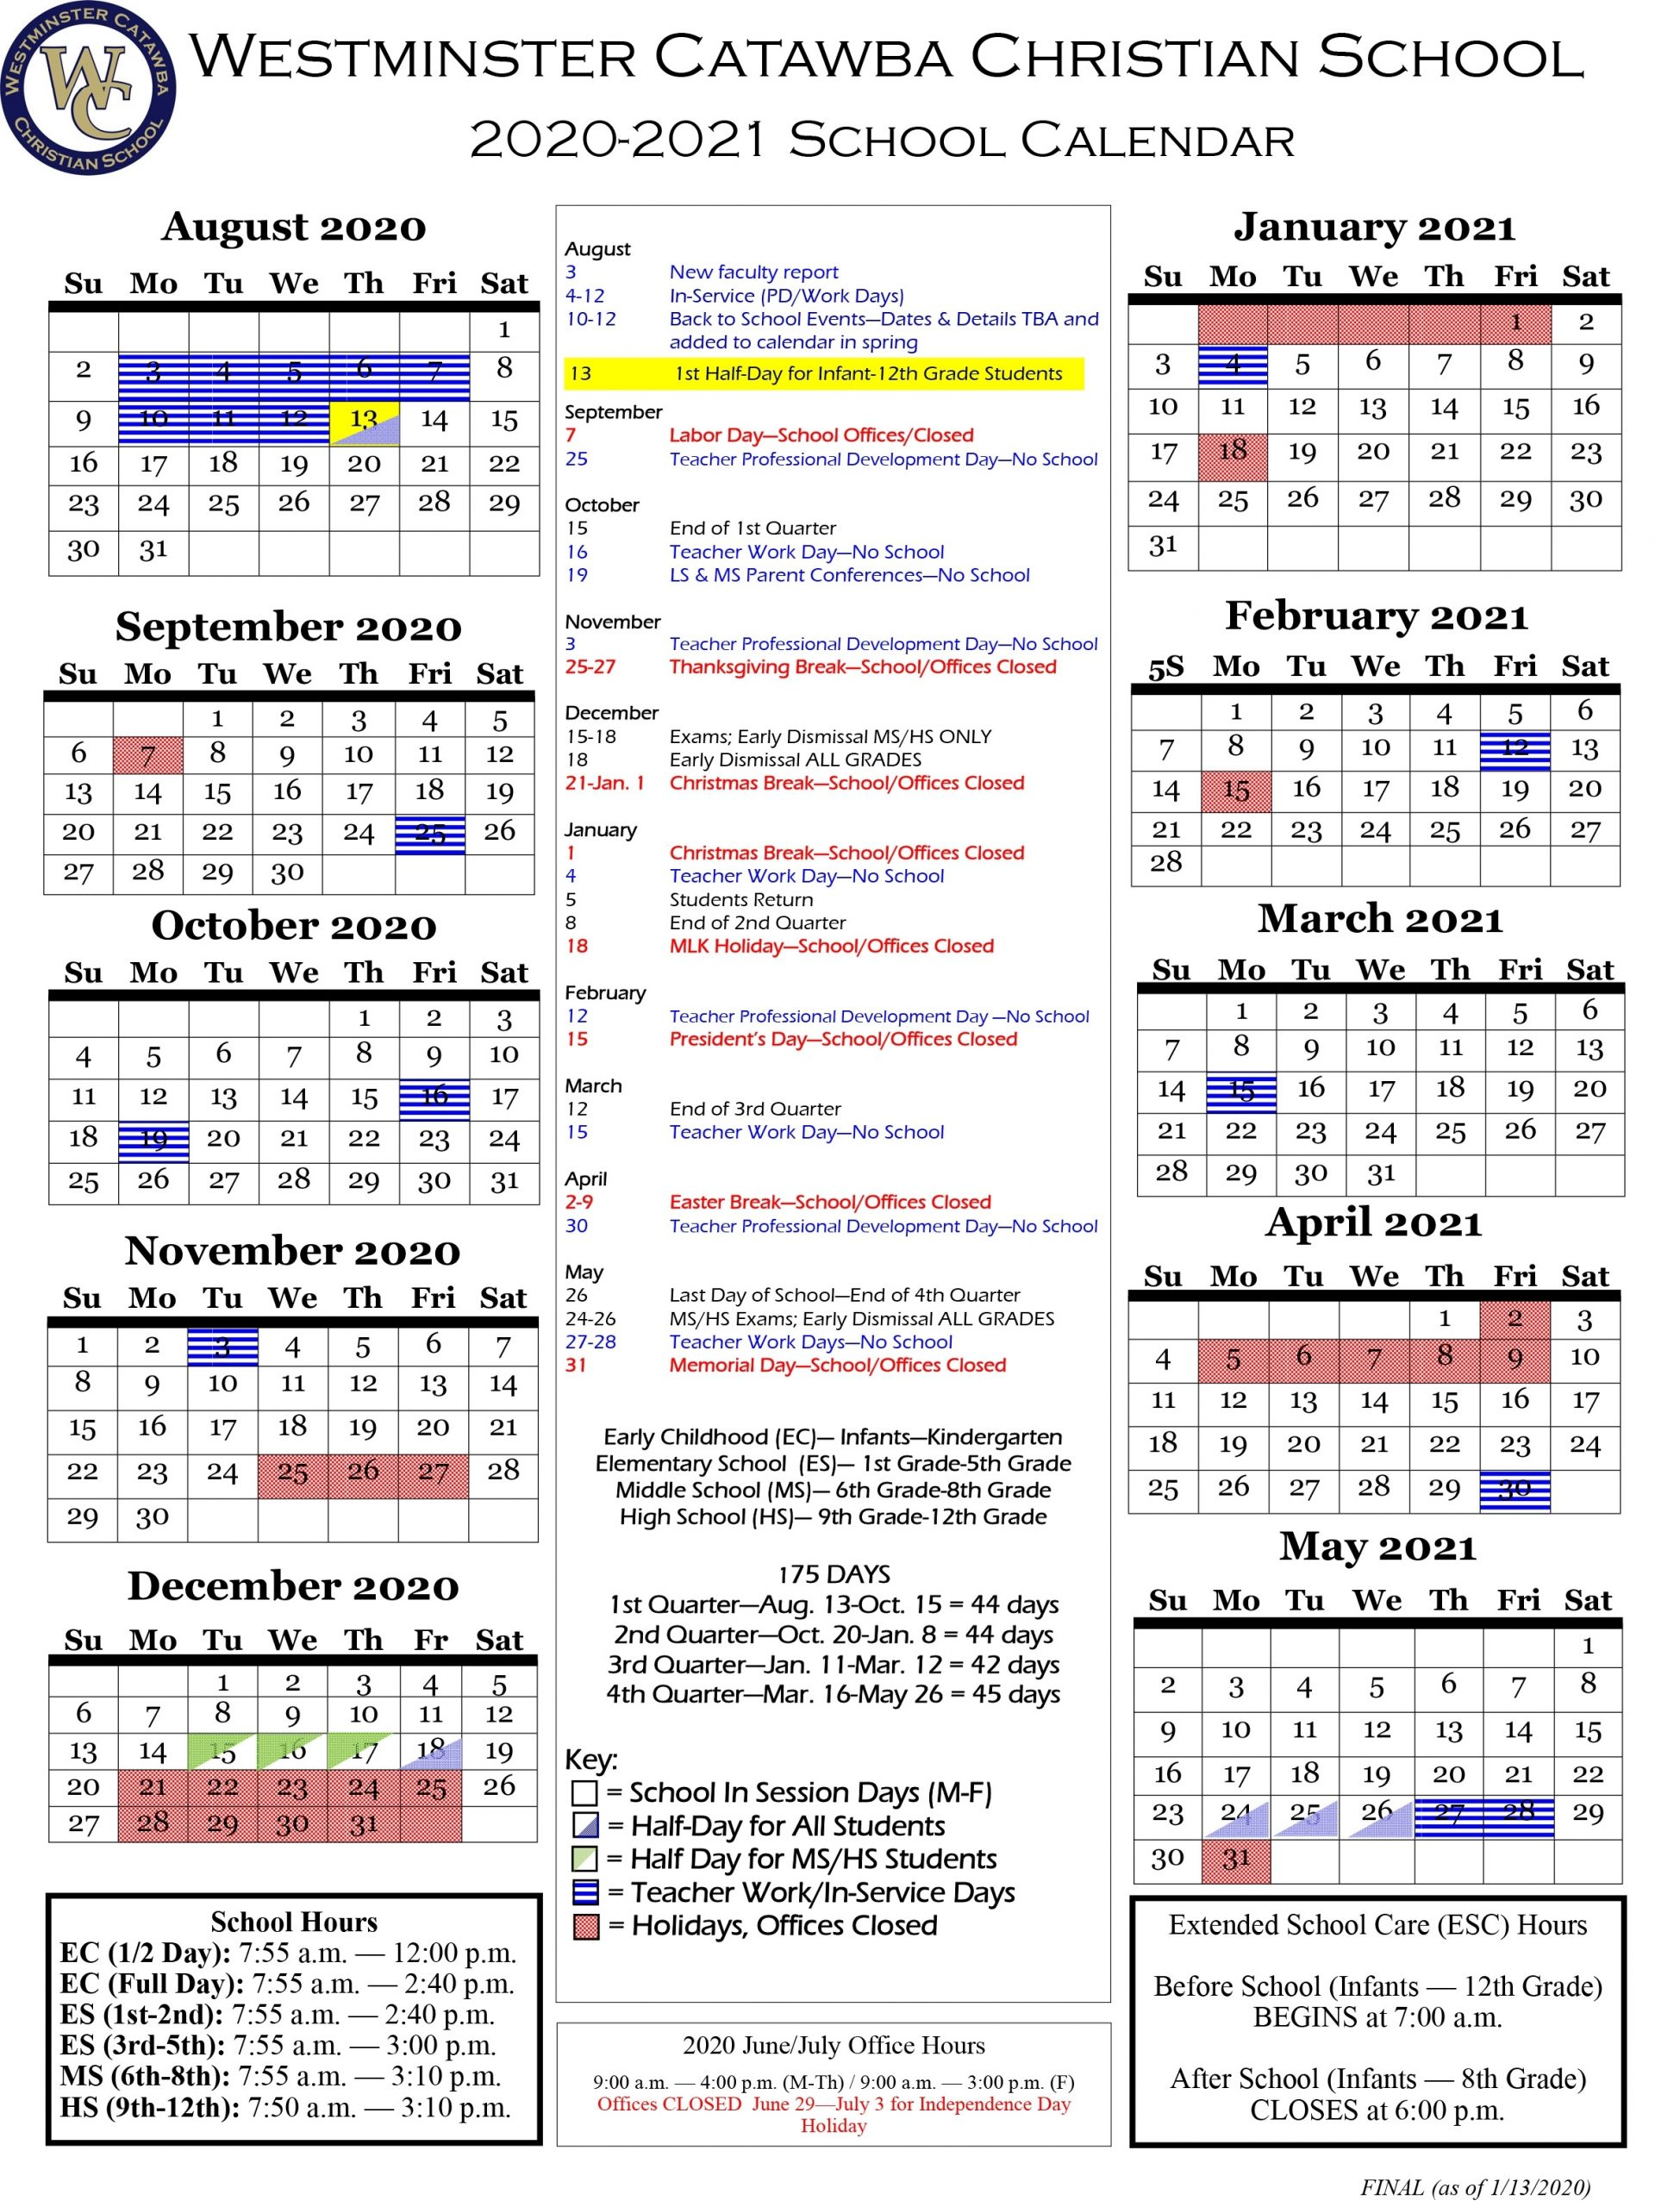 Academic Calendar - Westminster Catawba Christian School